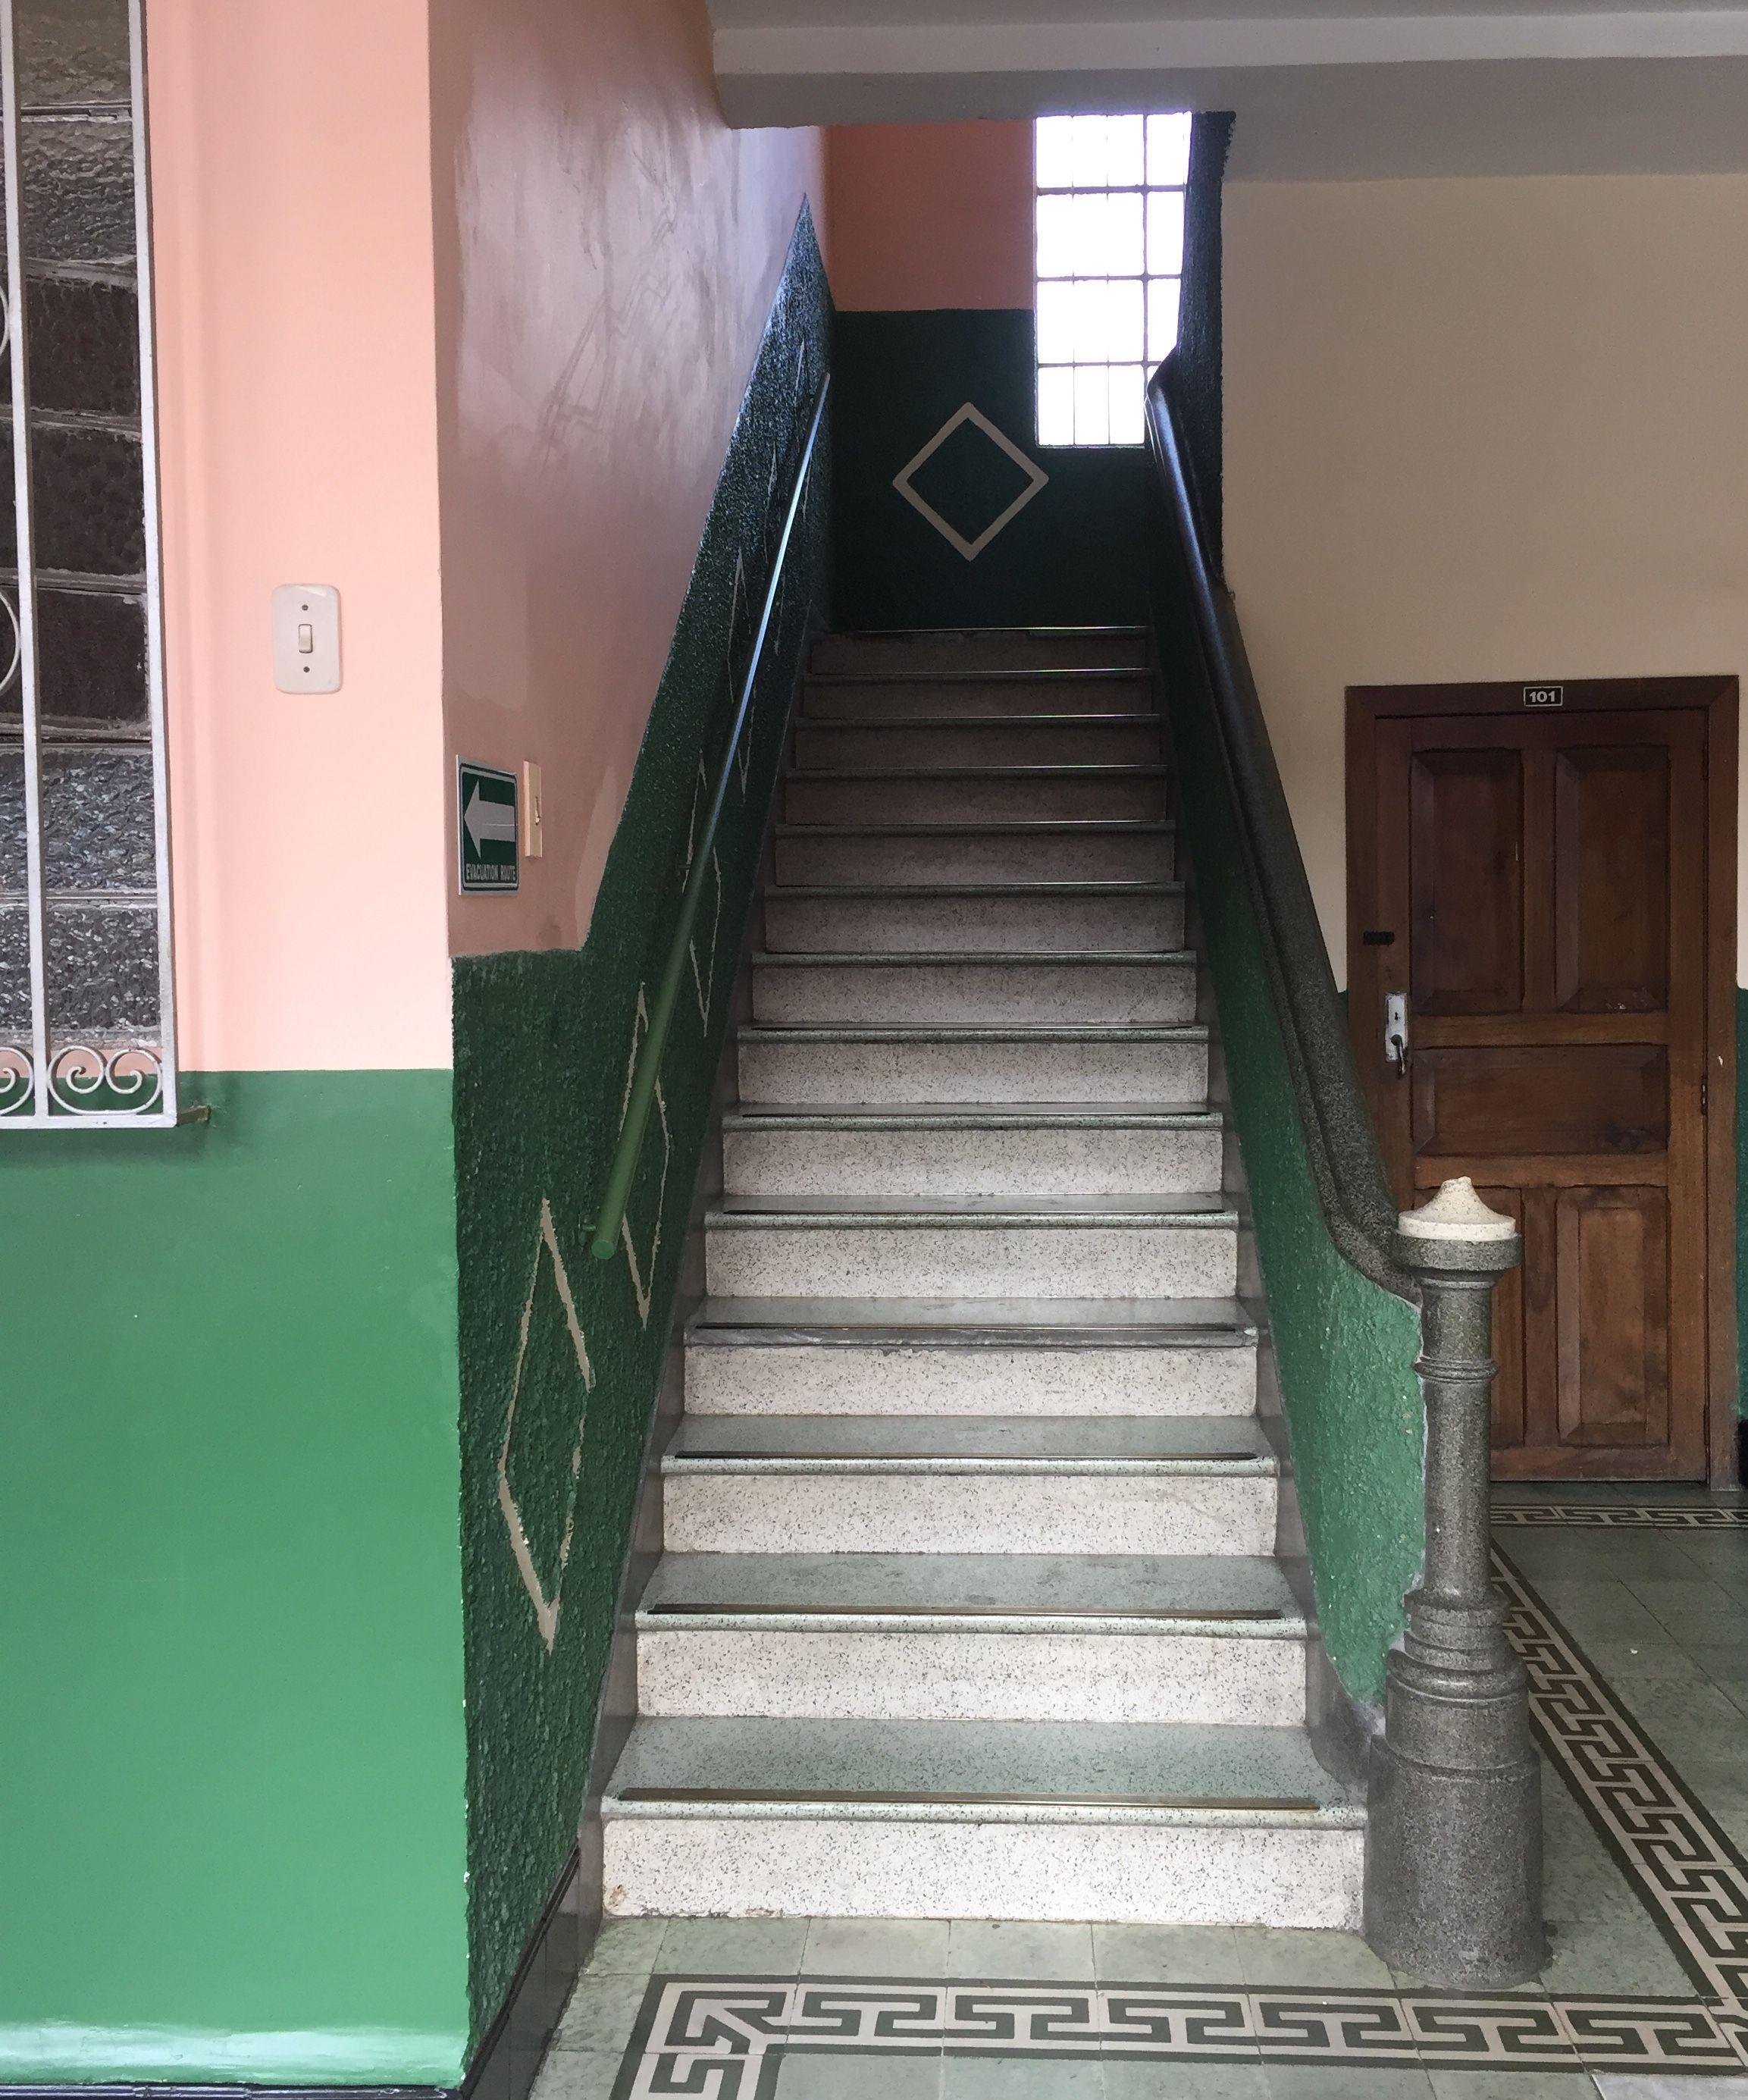 Colegio Maria Auxiliadora Chia Cundinamarca Colombia Mvao